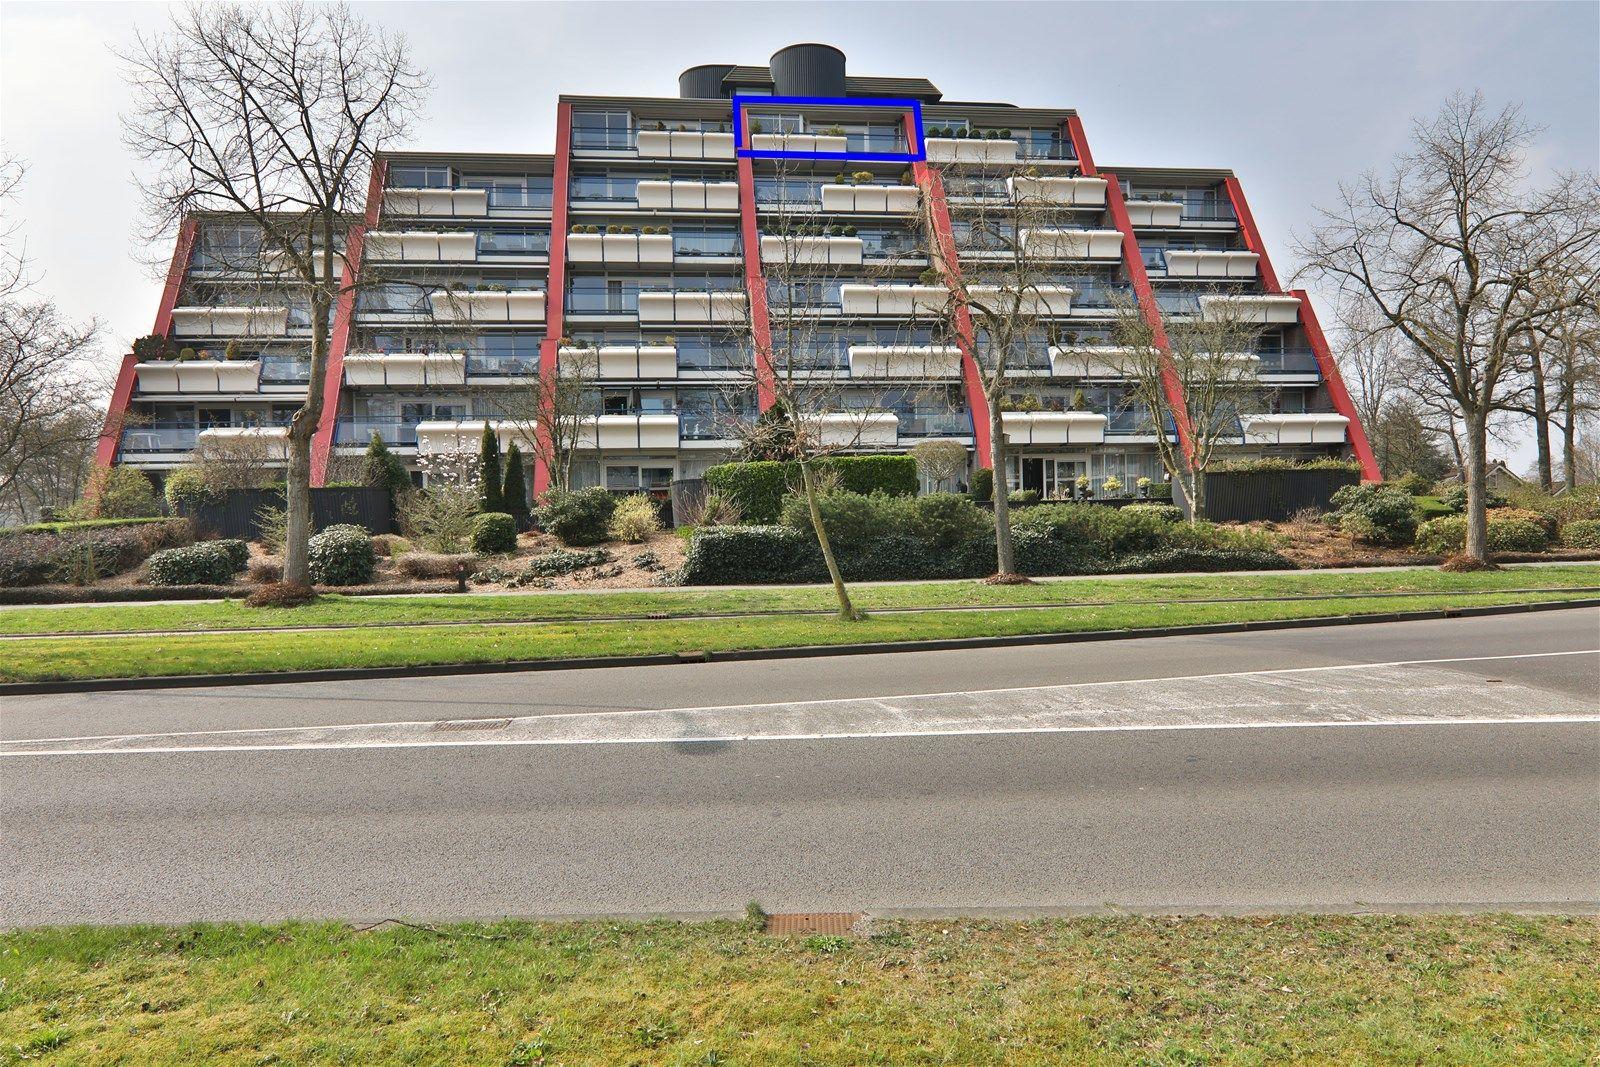 Alteveerstraat 214, Hoogeveen